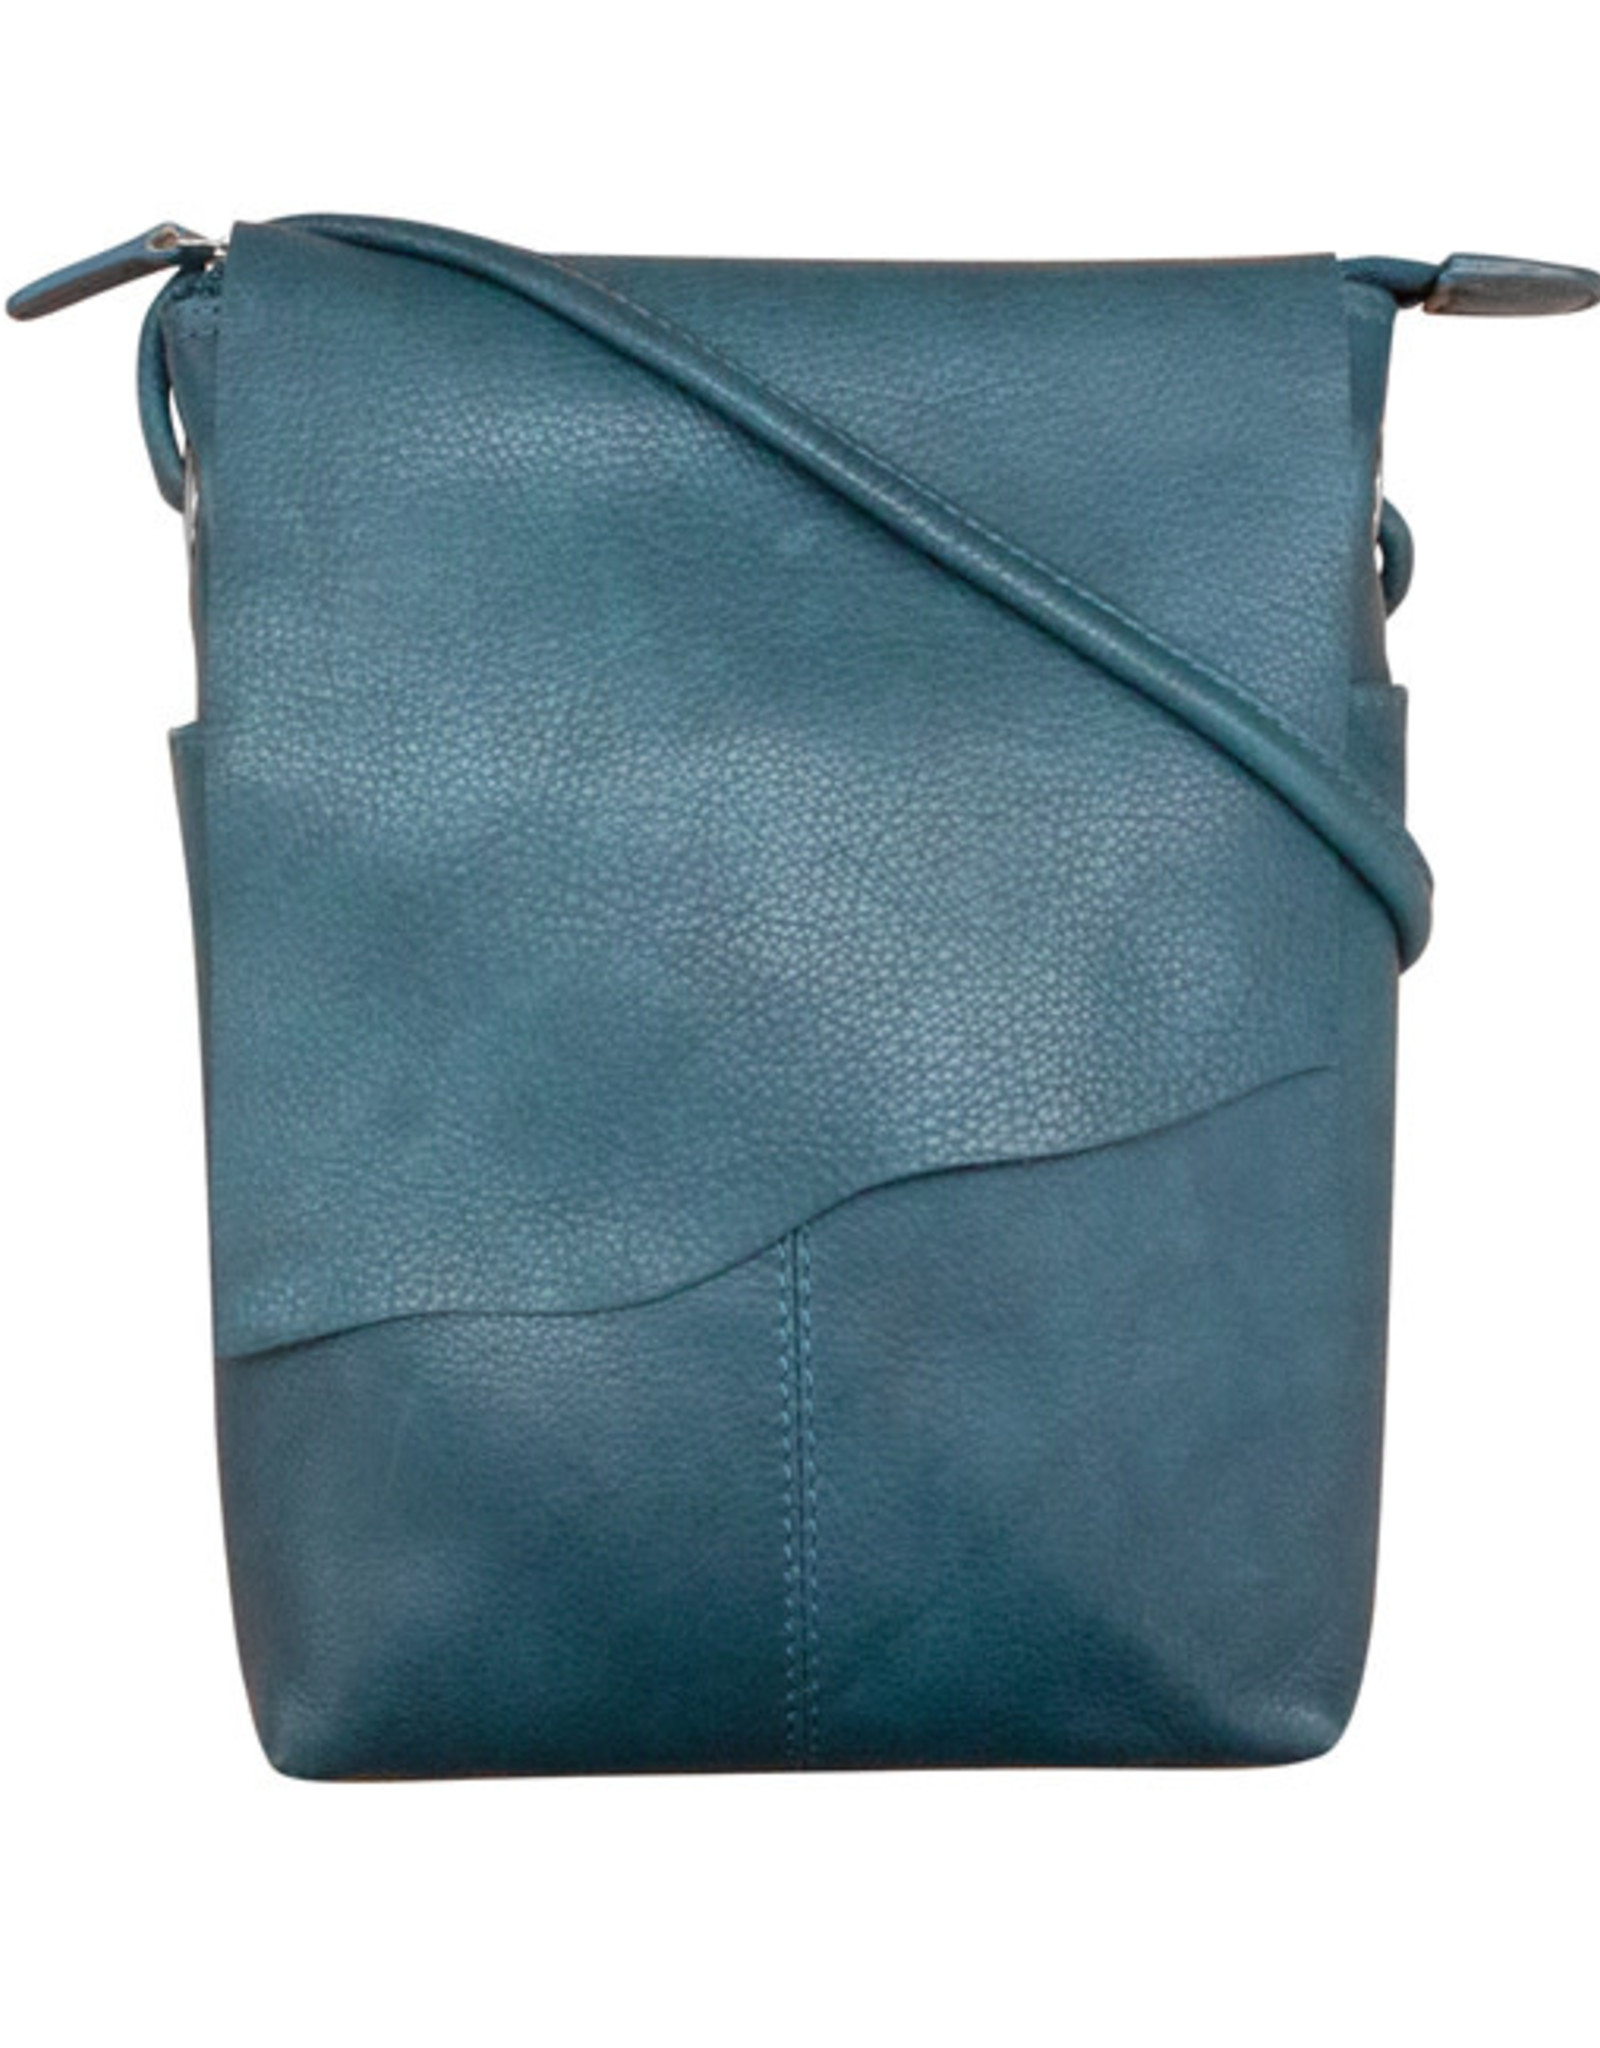 Leather Mini Sac